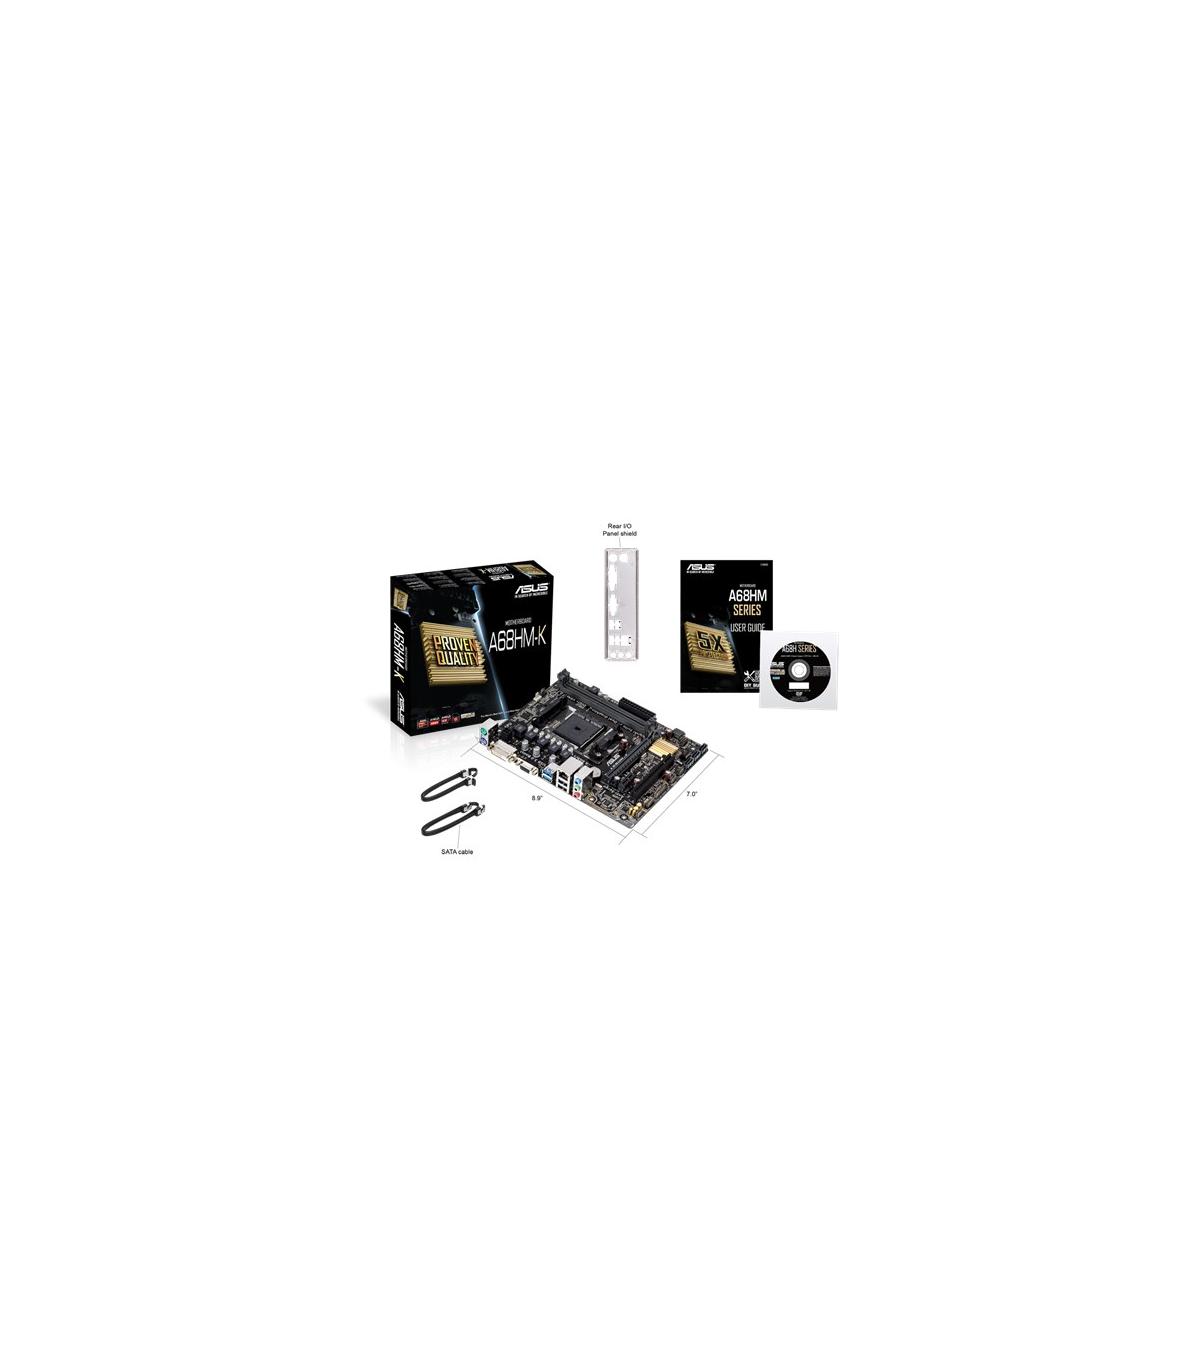 PB ASUS FM2 A68HM-K AMD/A68H/2DDR3/32GB/VGA+DVI/GBLAN/MATX (10)